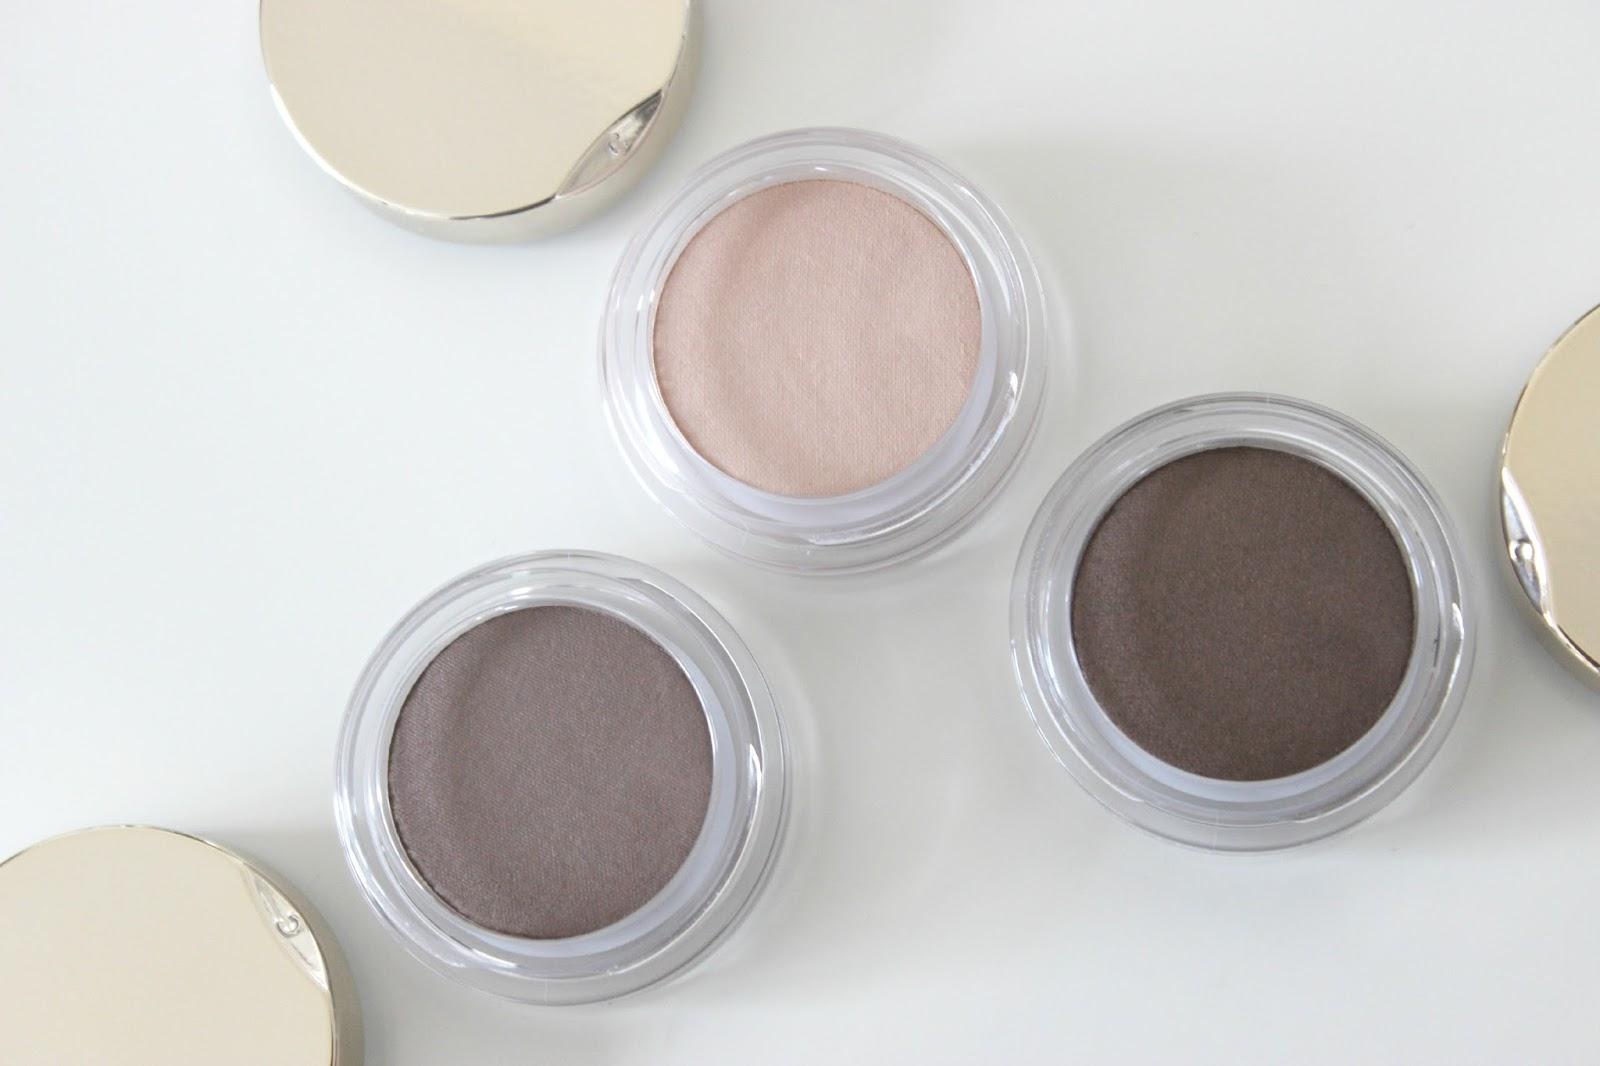 Top 5 Cream Eyeshadows That Won't Budge